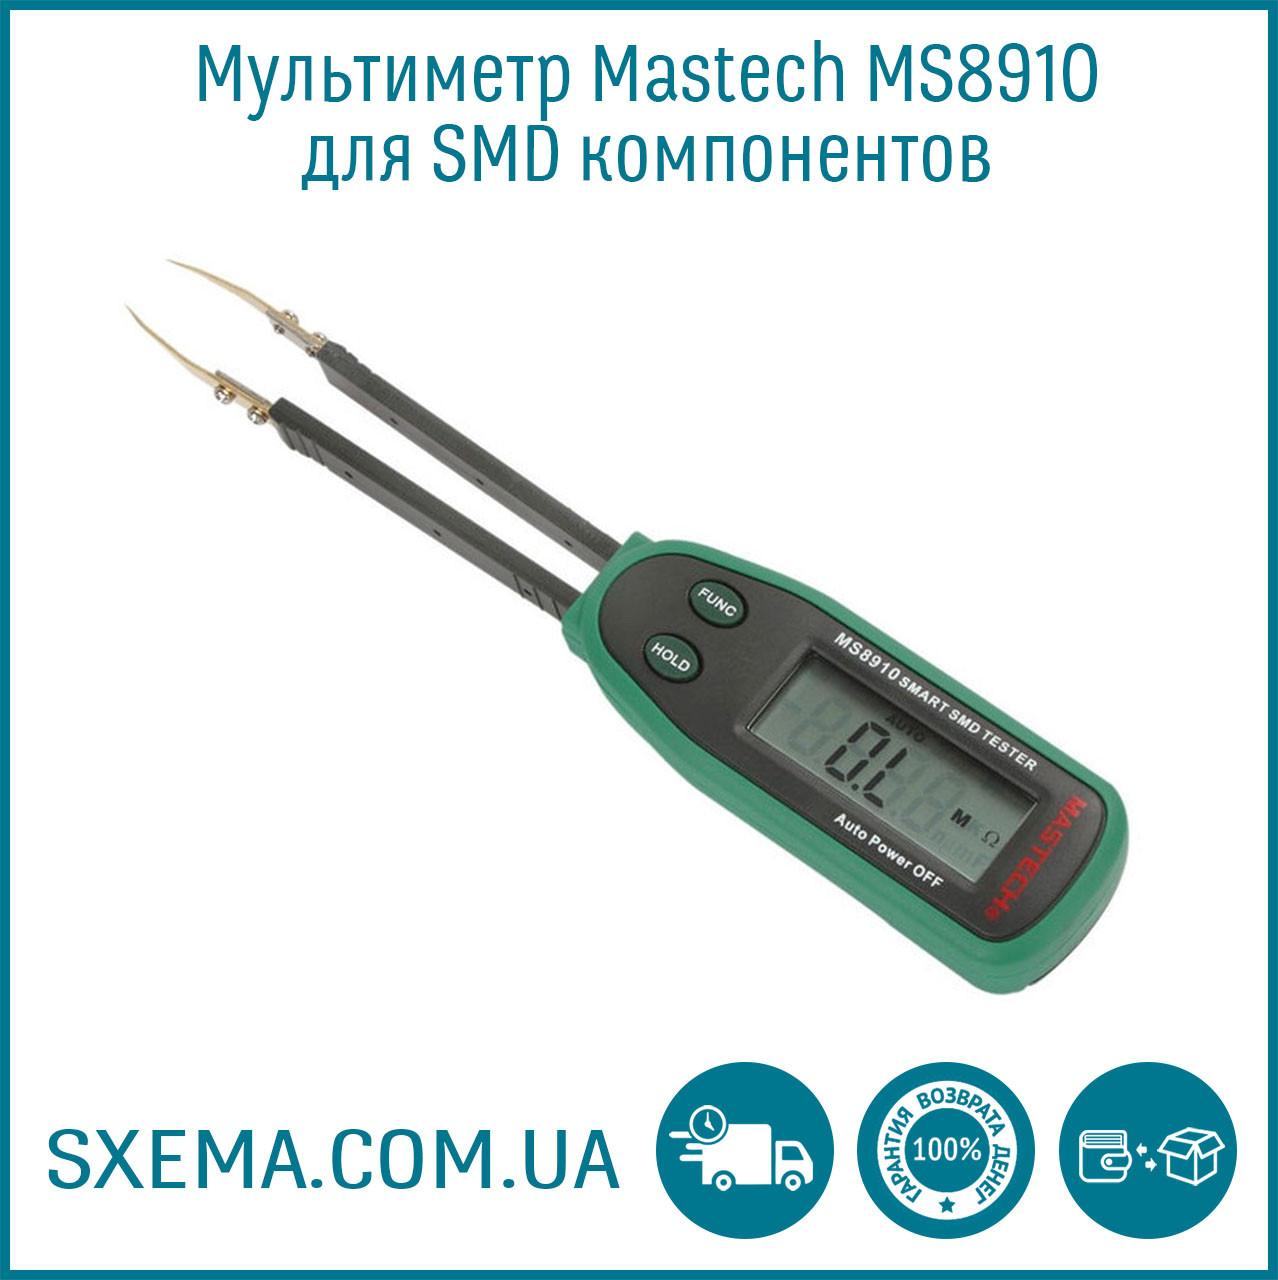 Мультиметр Mastech MS8910 для SMD компонентов